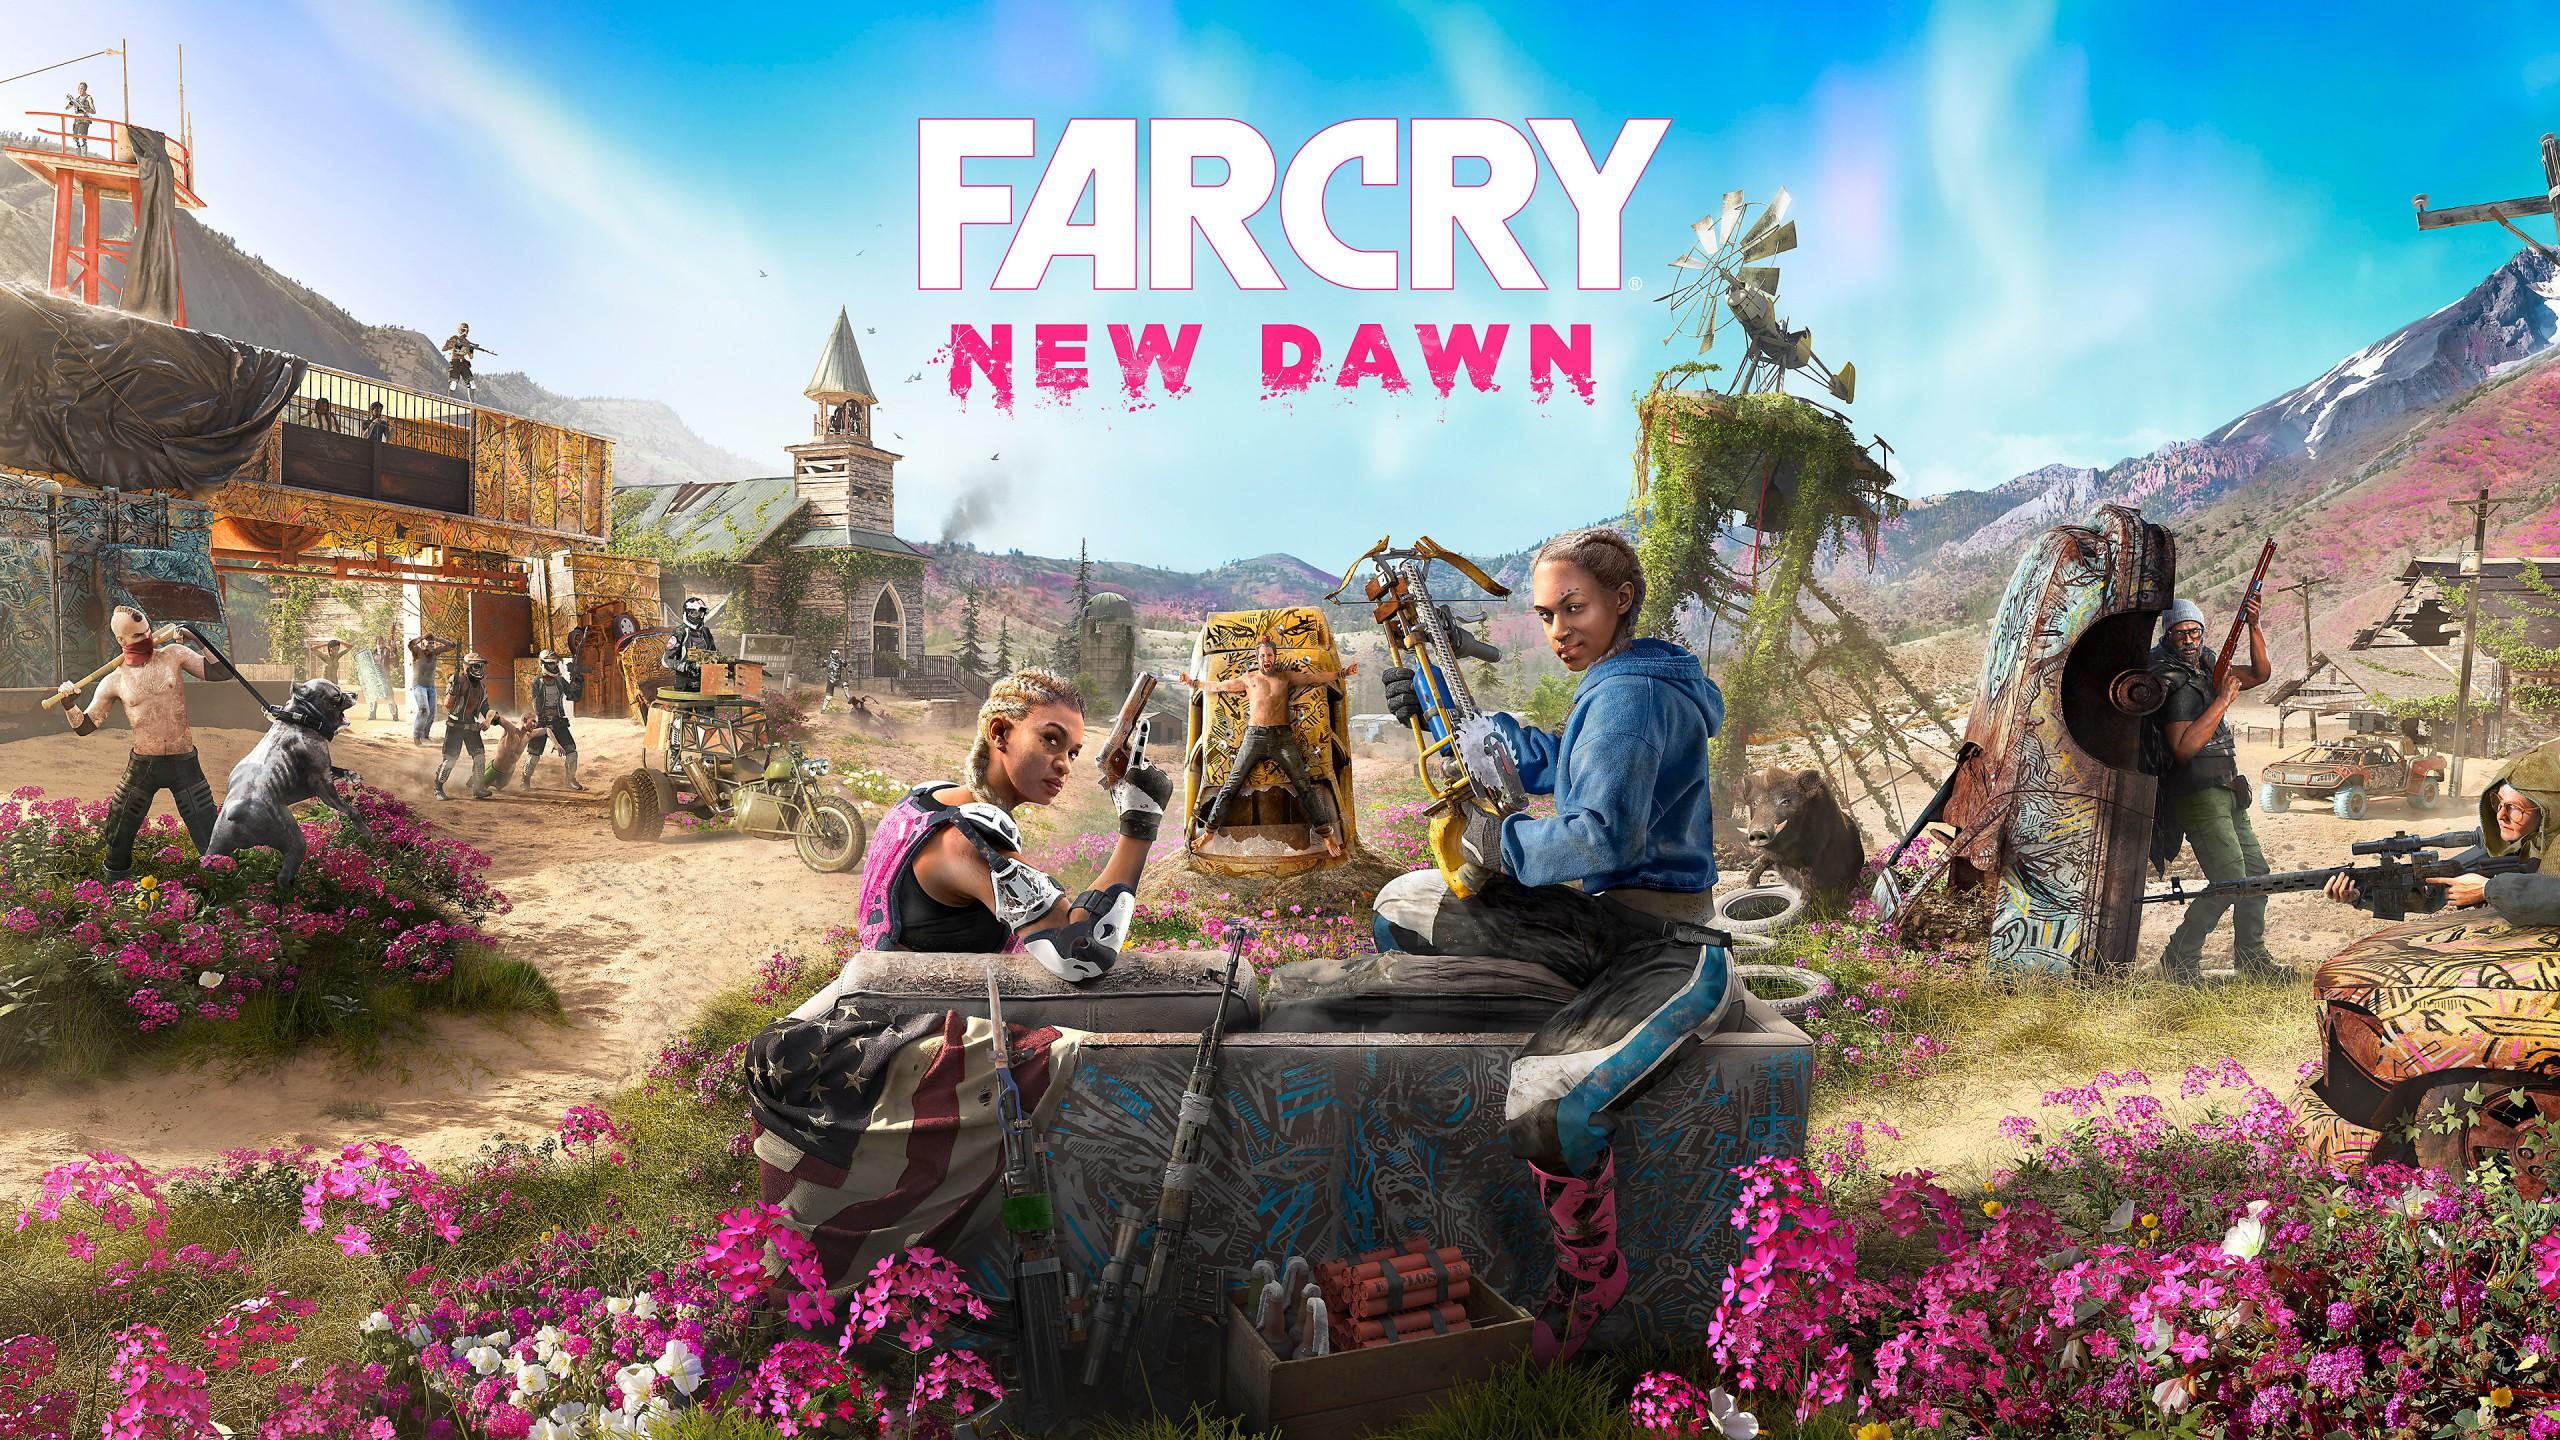 3d Desktop Wallpaper For Windows 7 Far Cry New Dawn Cover Art 2019 Game 4k Wallpapers Hd